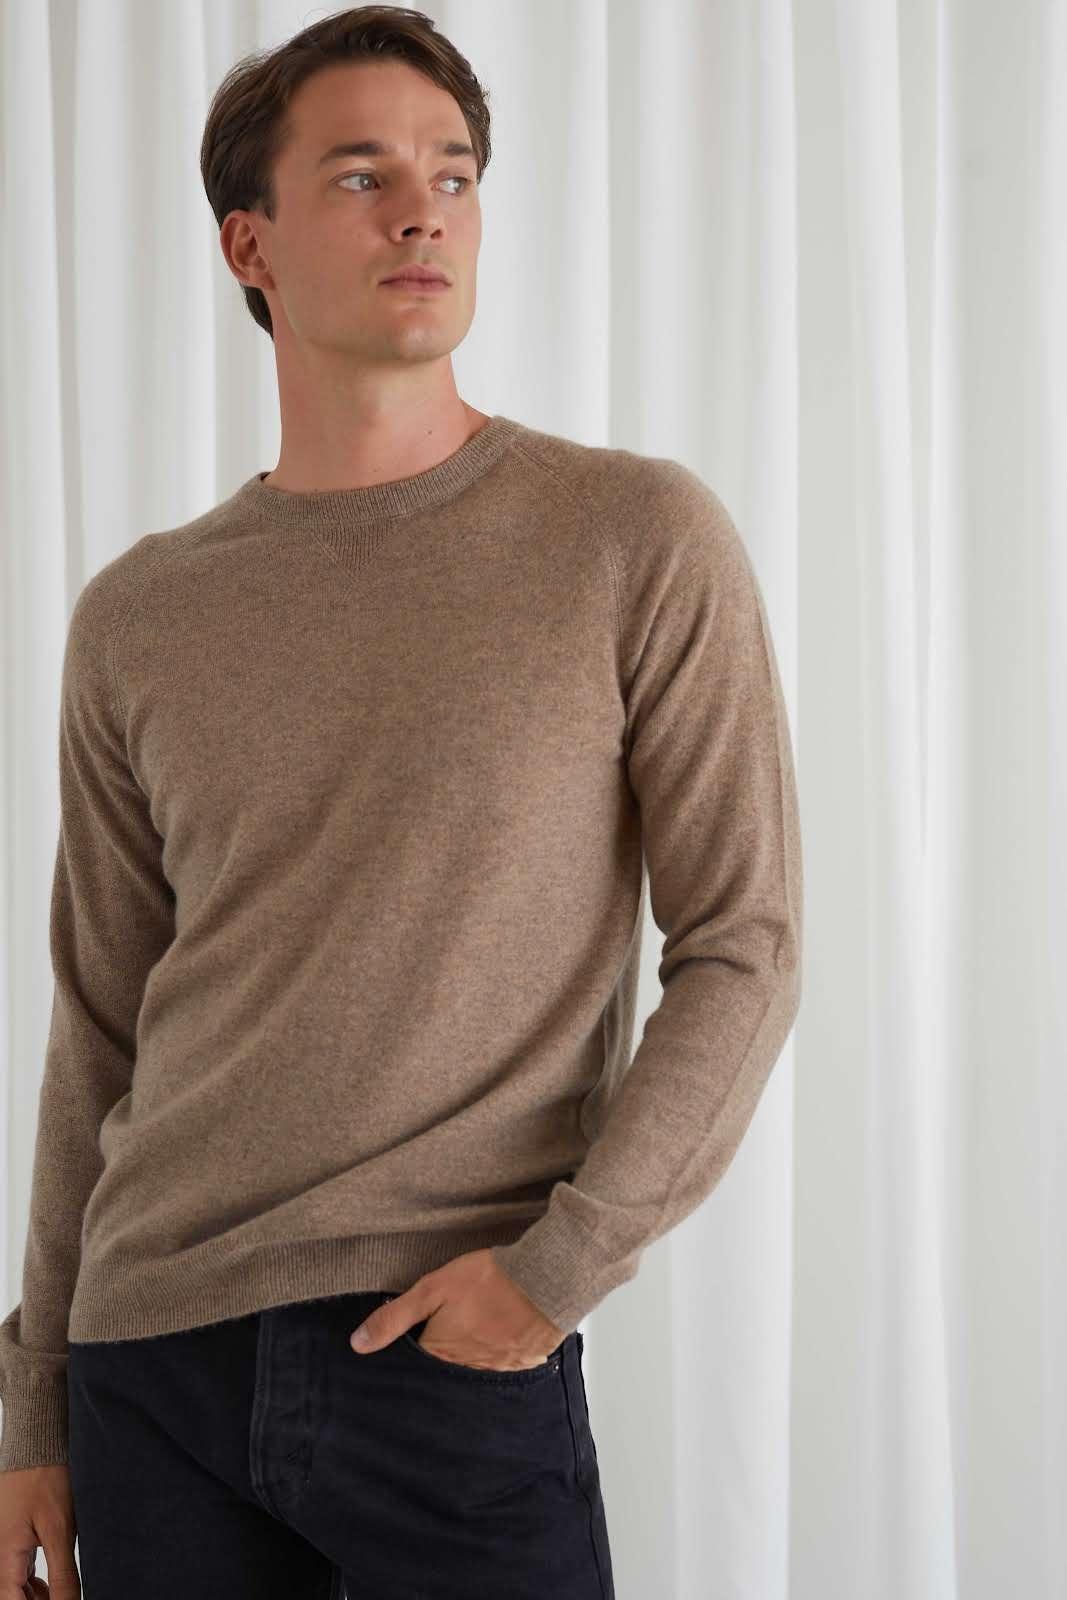 Man College Sweater